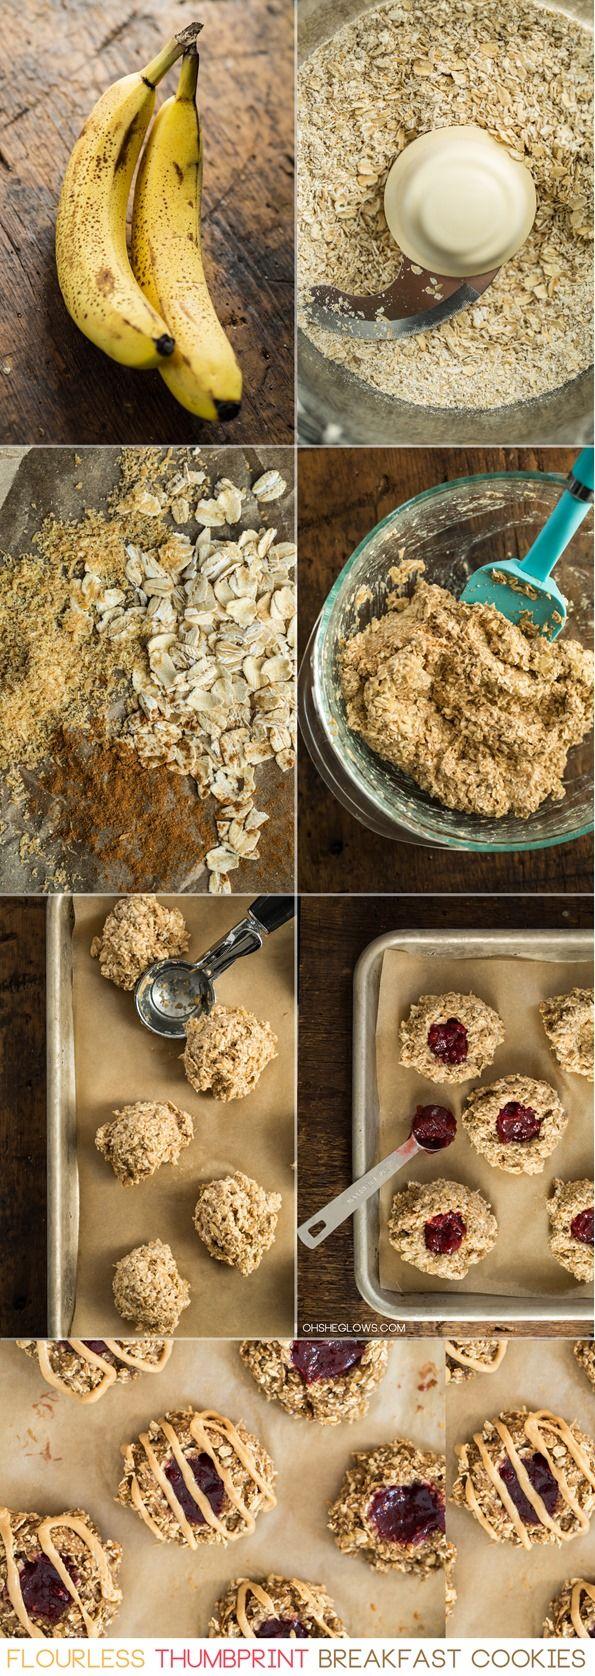 breakfastcookiesglutenfreevegan   Flourless Thumbprint Breakfast Cookies (Vegan + GF)